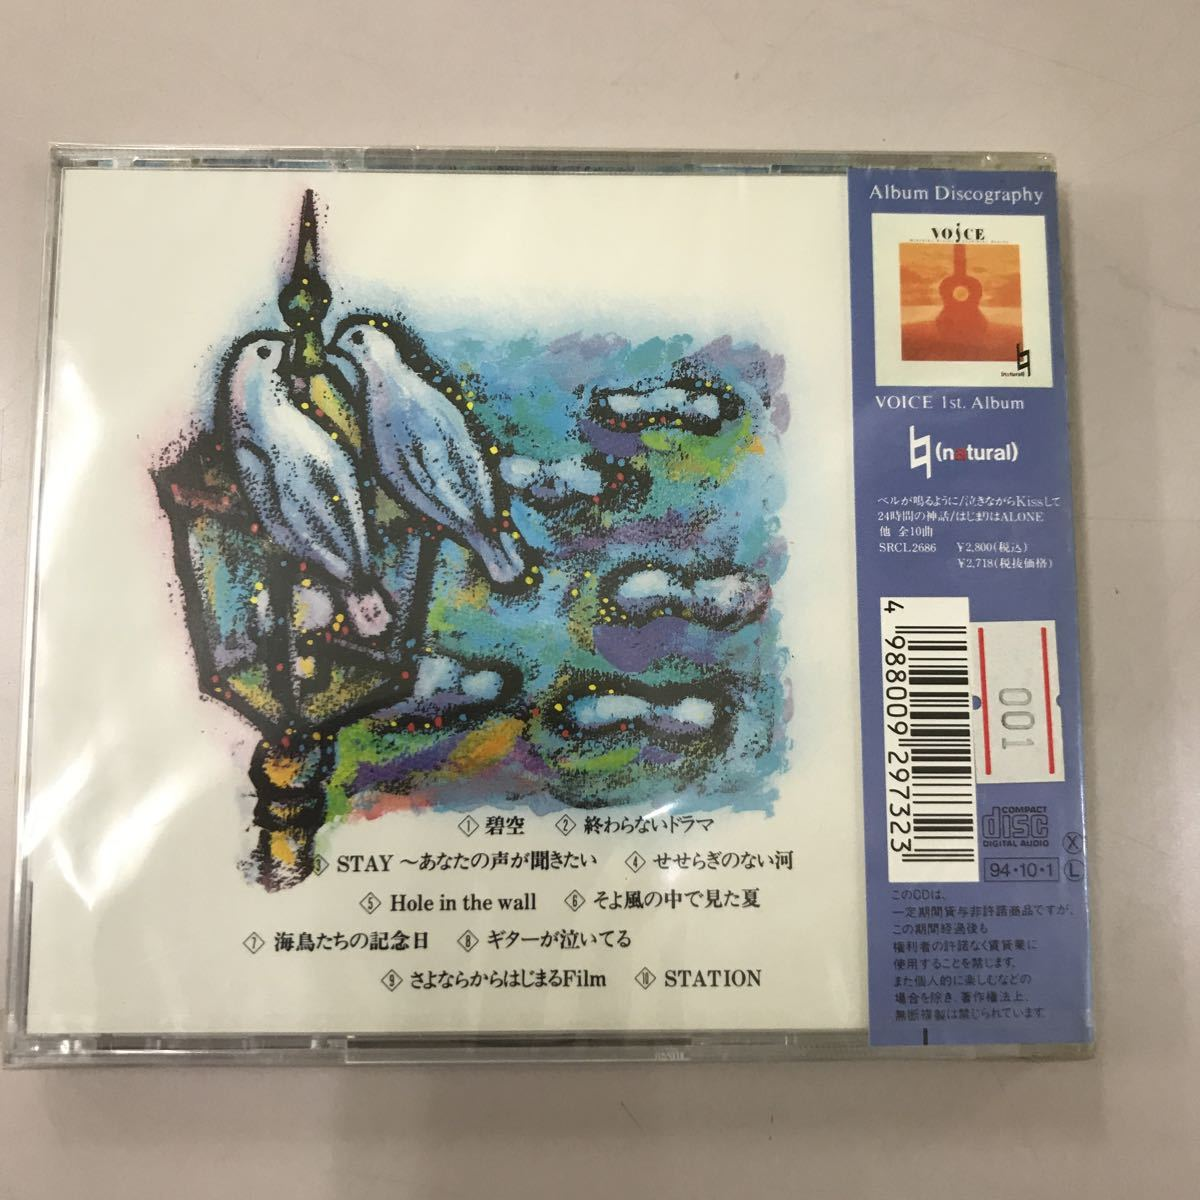 CD 新品未開封【邦楽】長期保存品 Voice ブルー